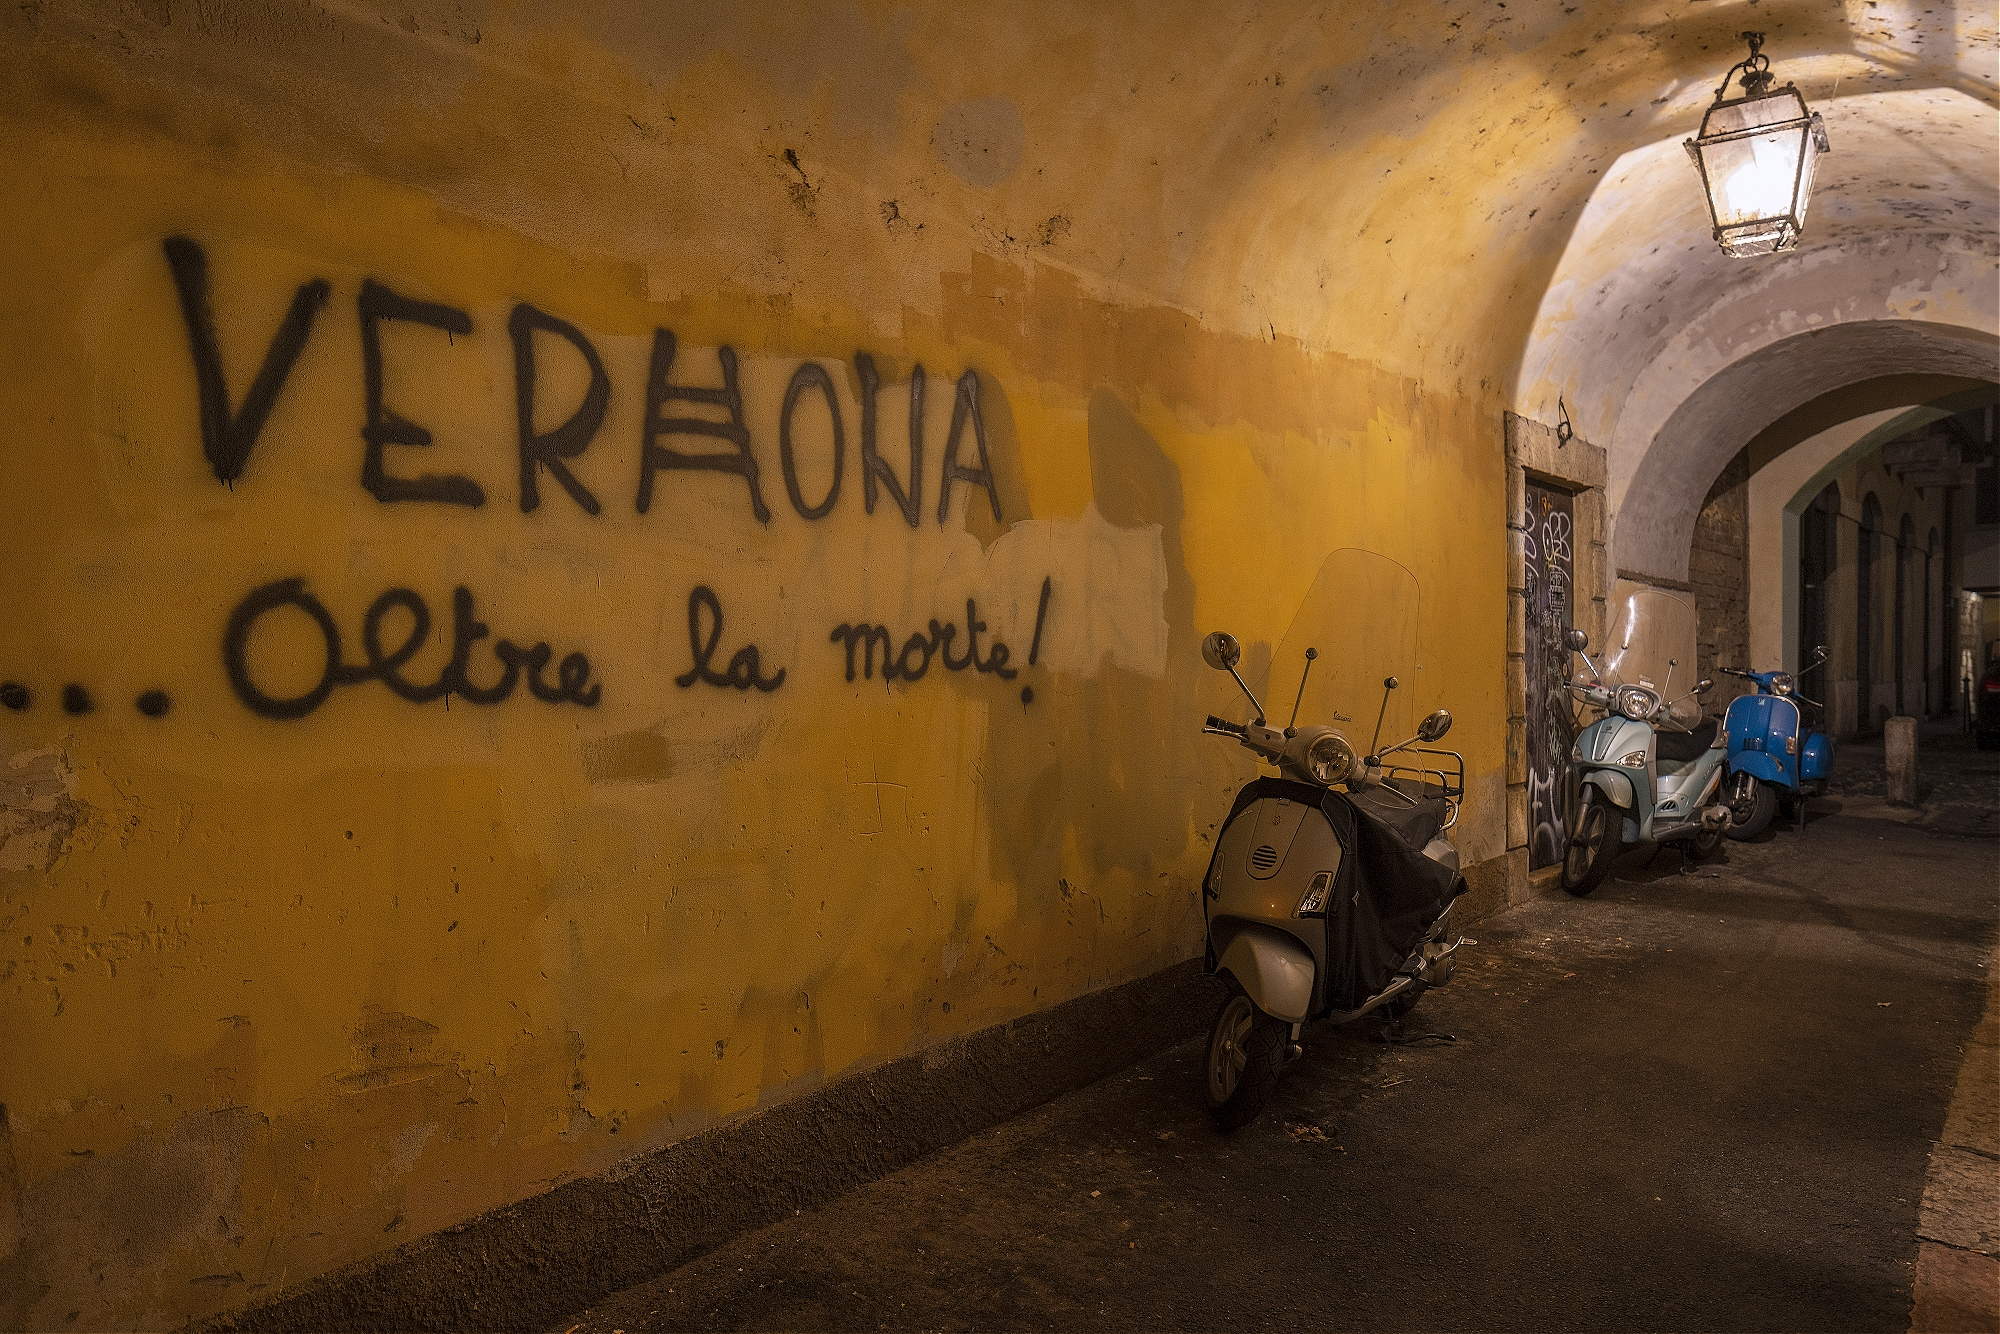 Underpass, Verona